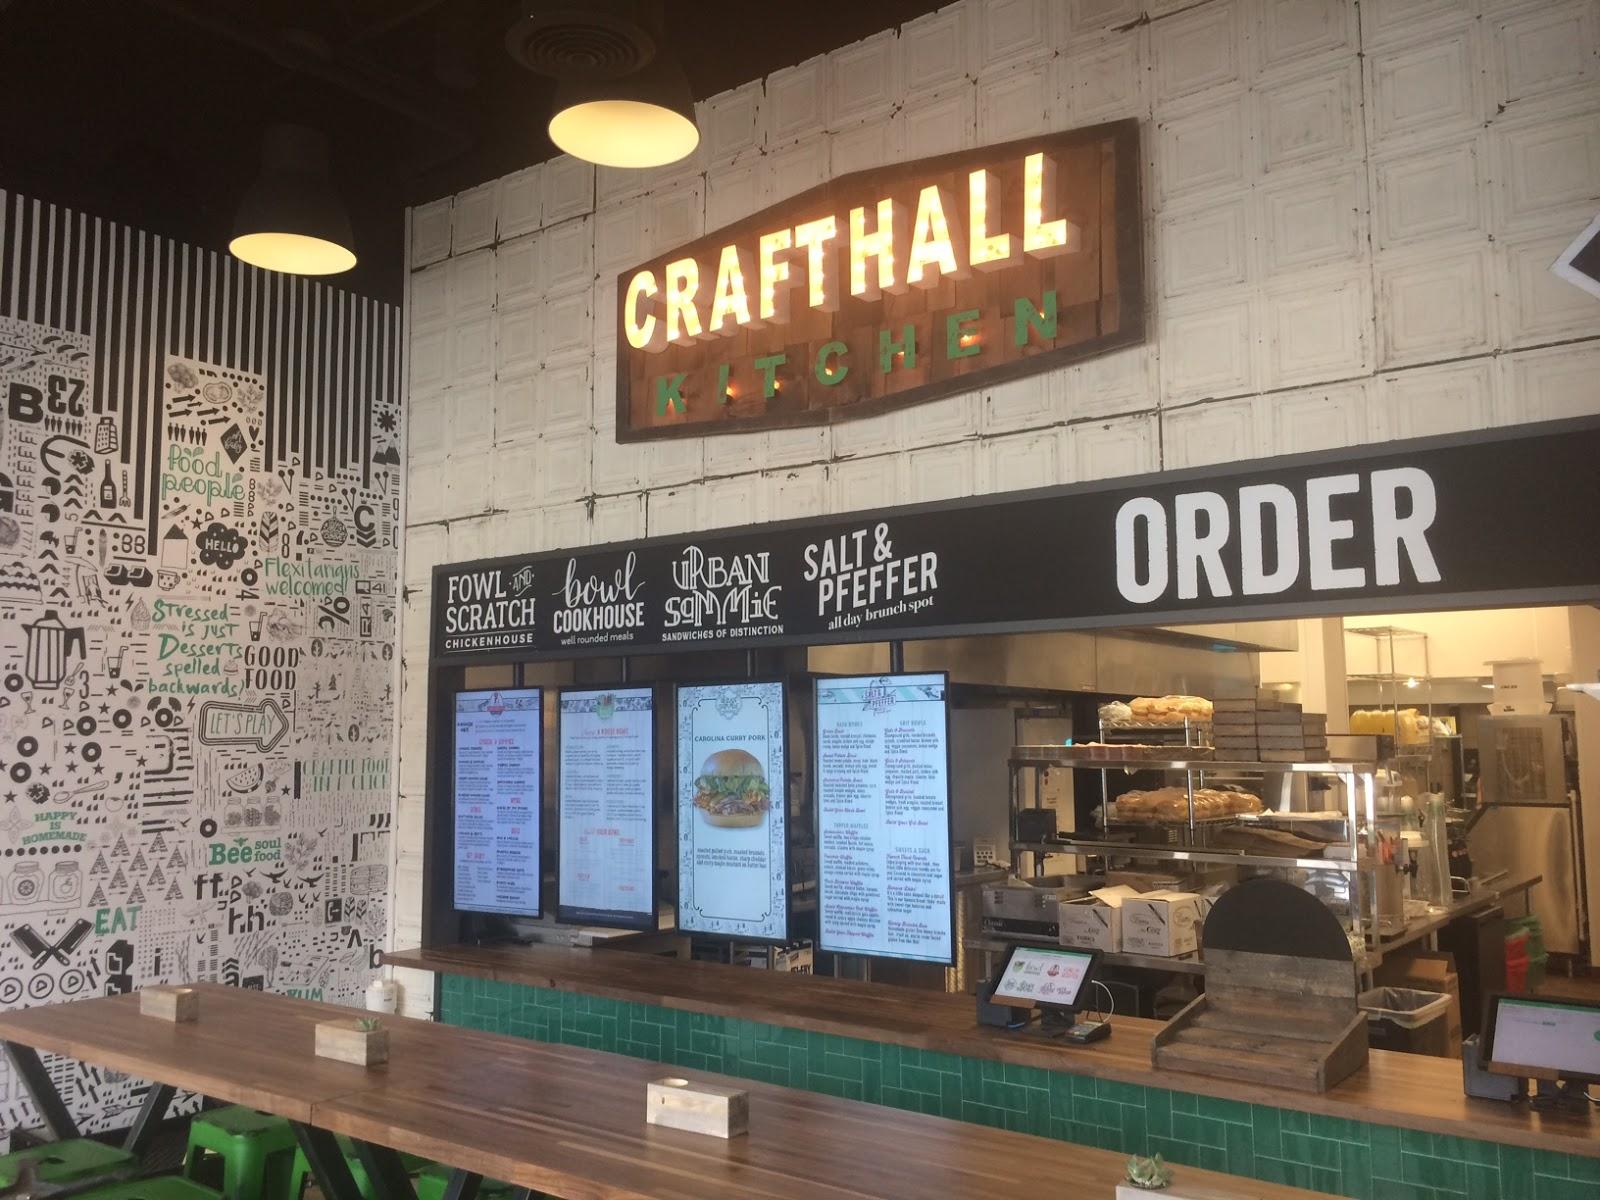 Tomorrow S News Today Atlanta Opening Alert Crafthall